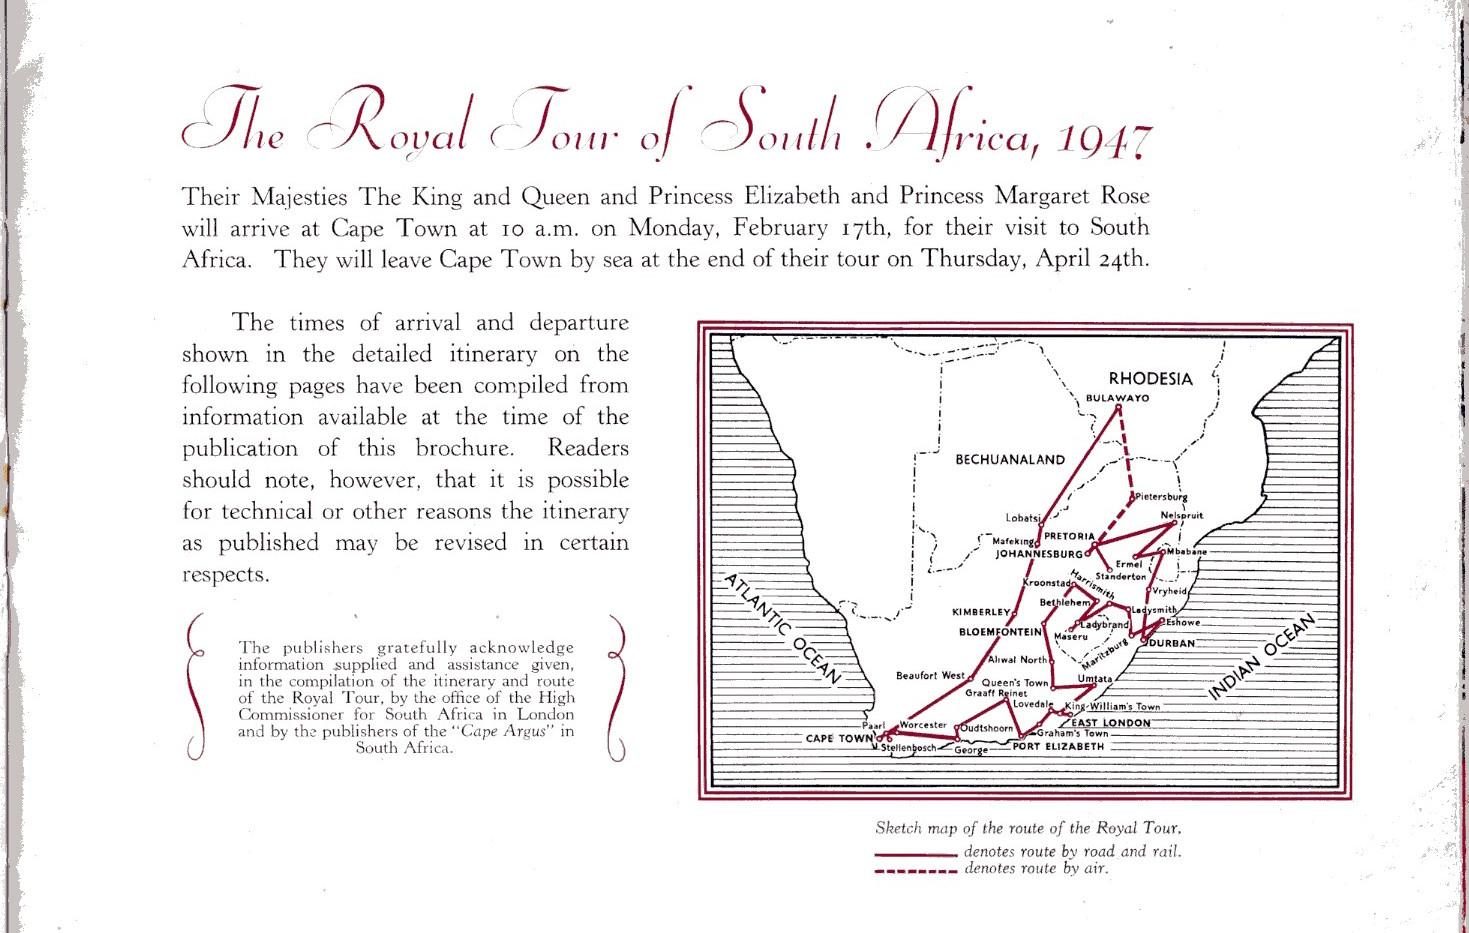 S-Africa Tour brochure (4).jpg